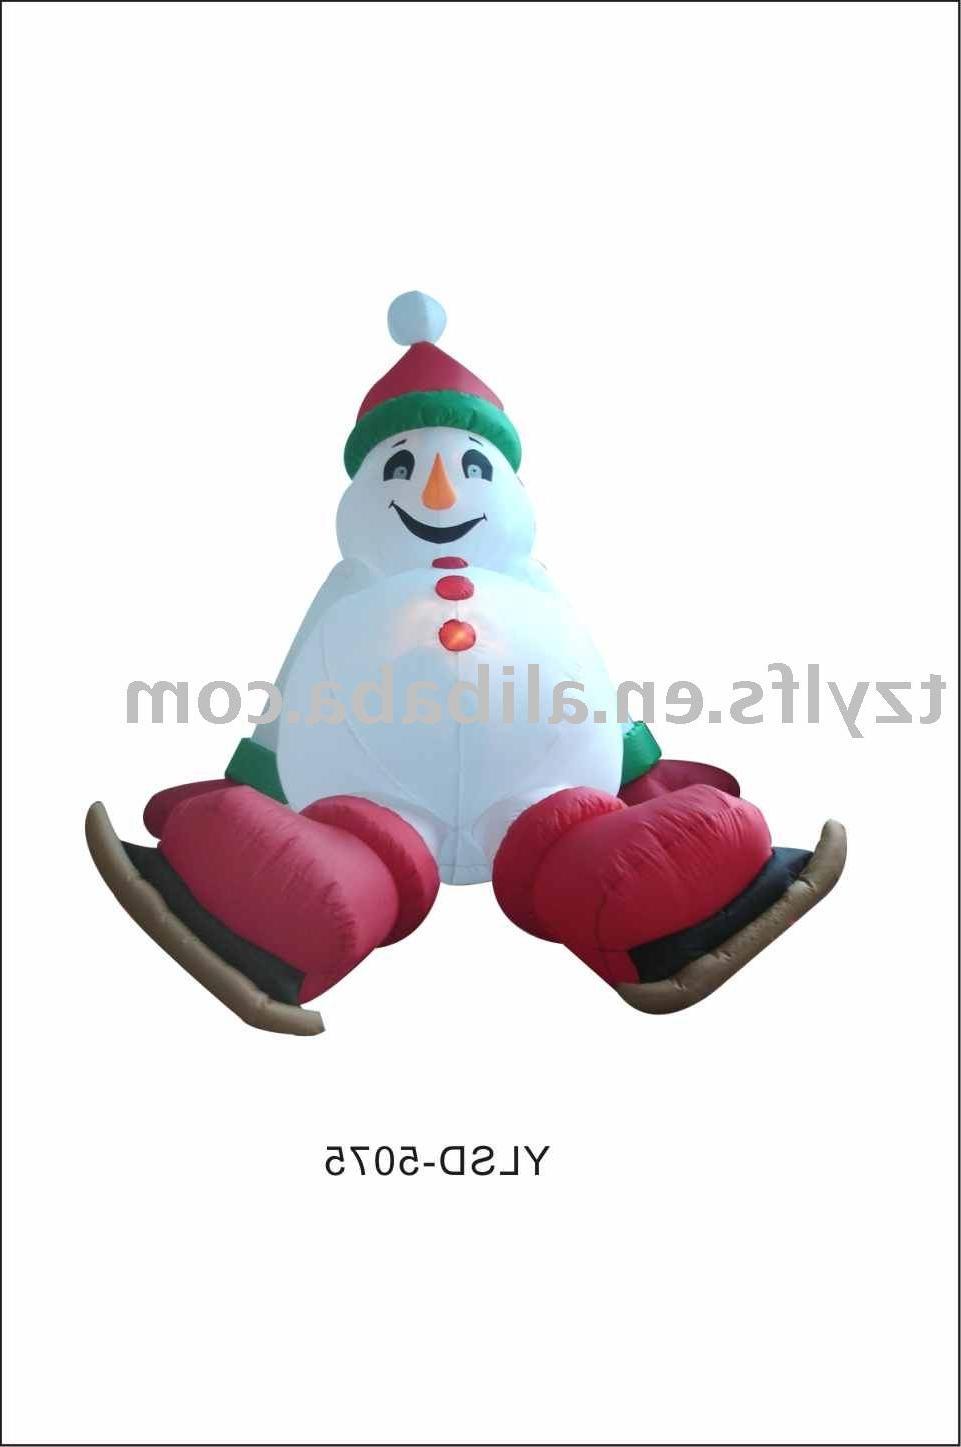 See larger image: Inflatable Christmas Cartoon Christmas Figure